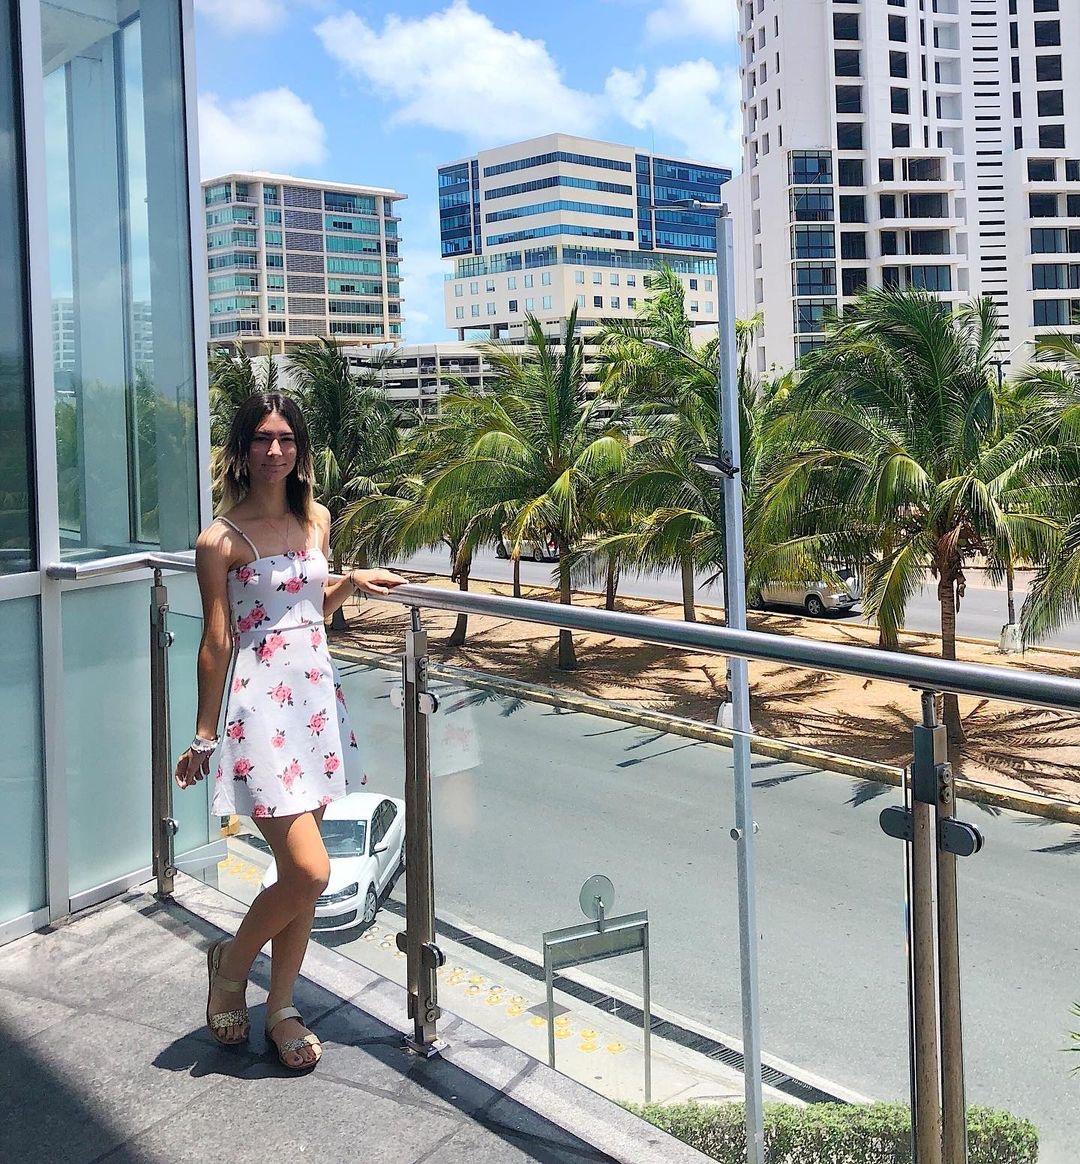 Plaza-Las-Américas-Cancún